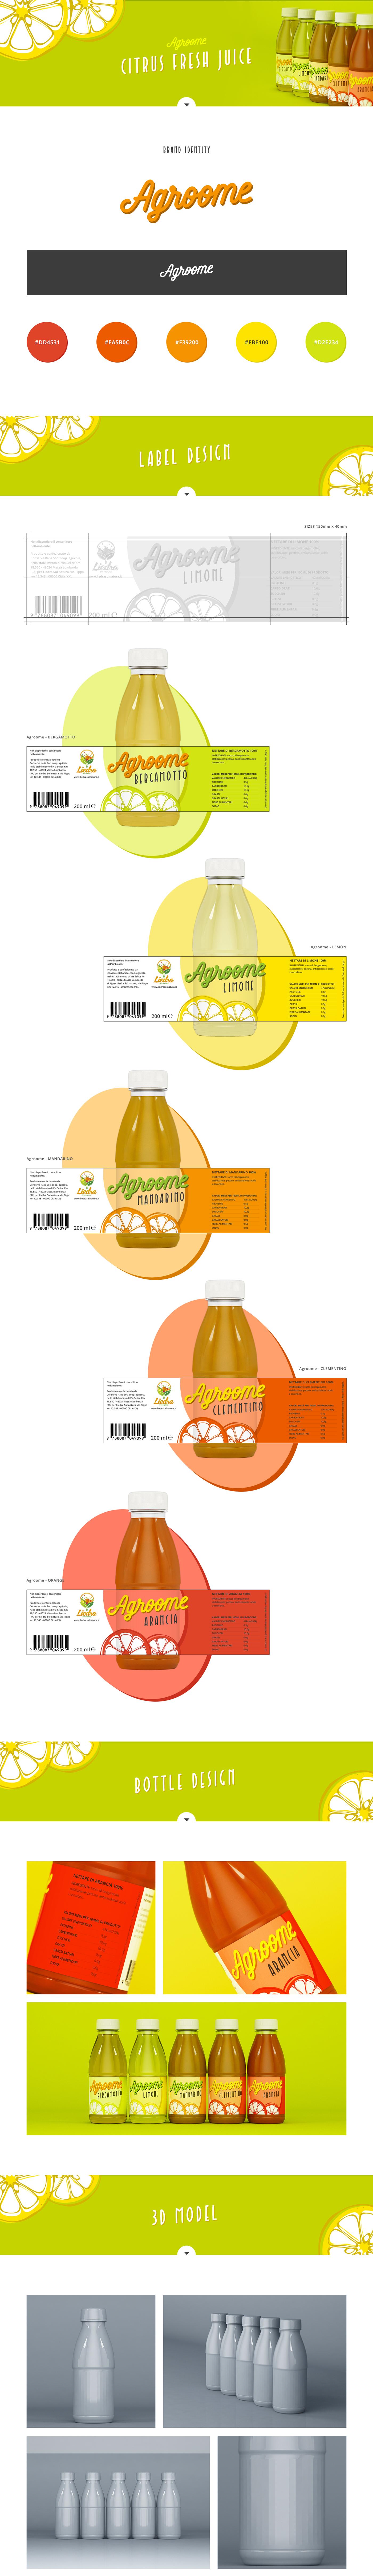 juice citrus bio logo design brand bottle organic biological Biologic orange lemon 3D CALLIGRAPHY TYPE  Label